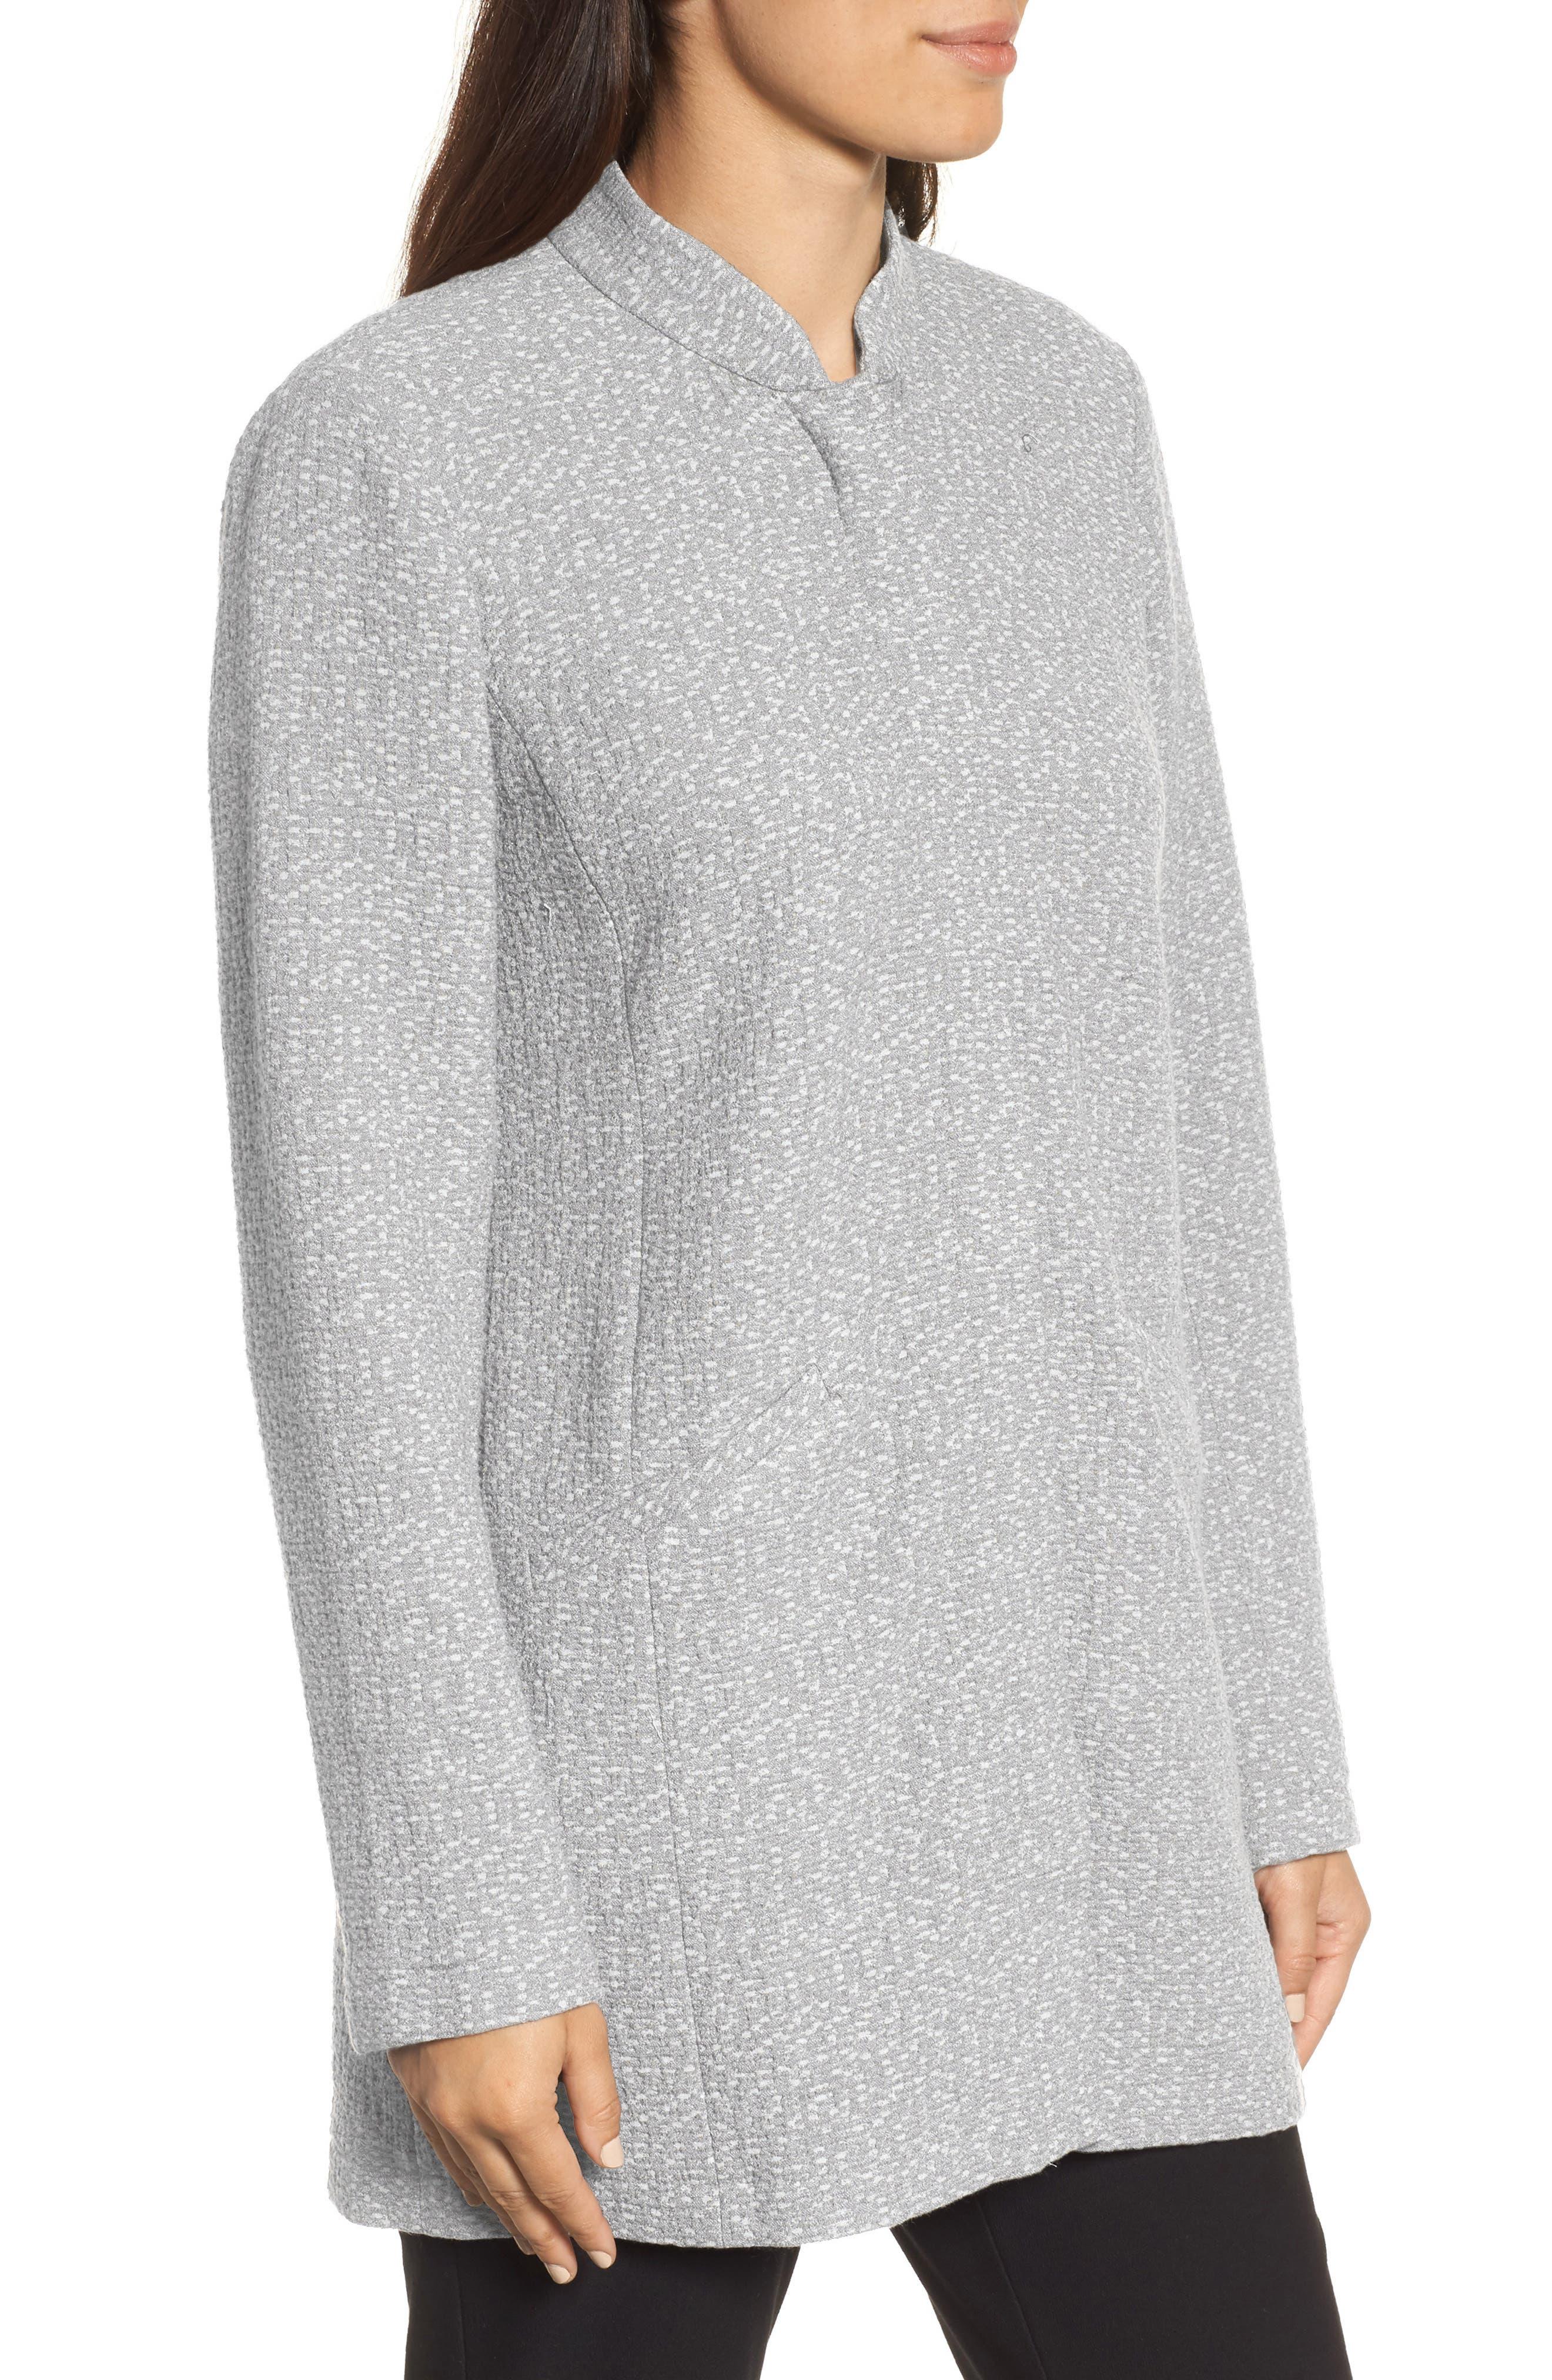 Tweed Jacket,                             Alternate thumbnail 4, color,                             022